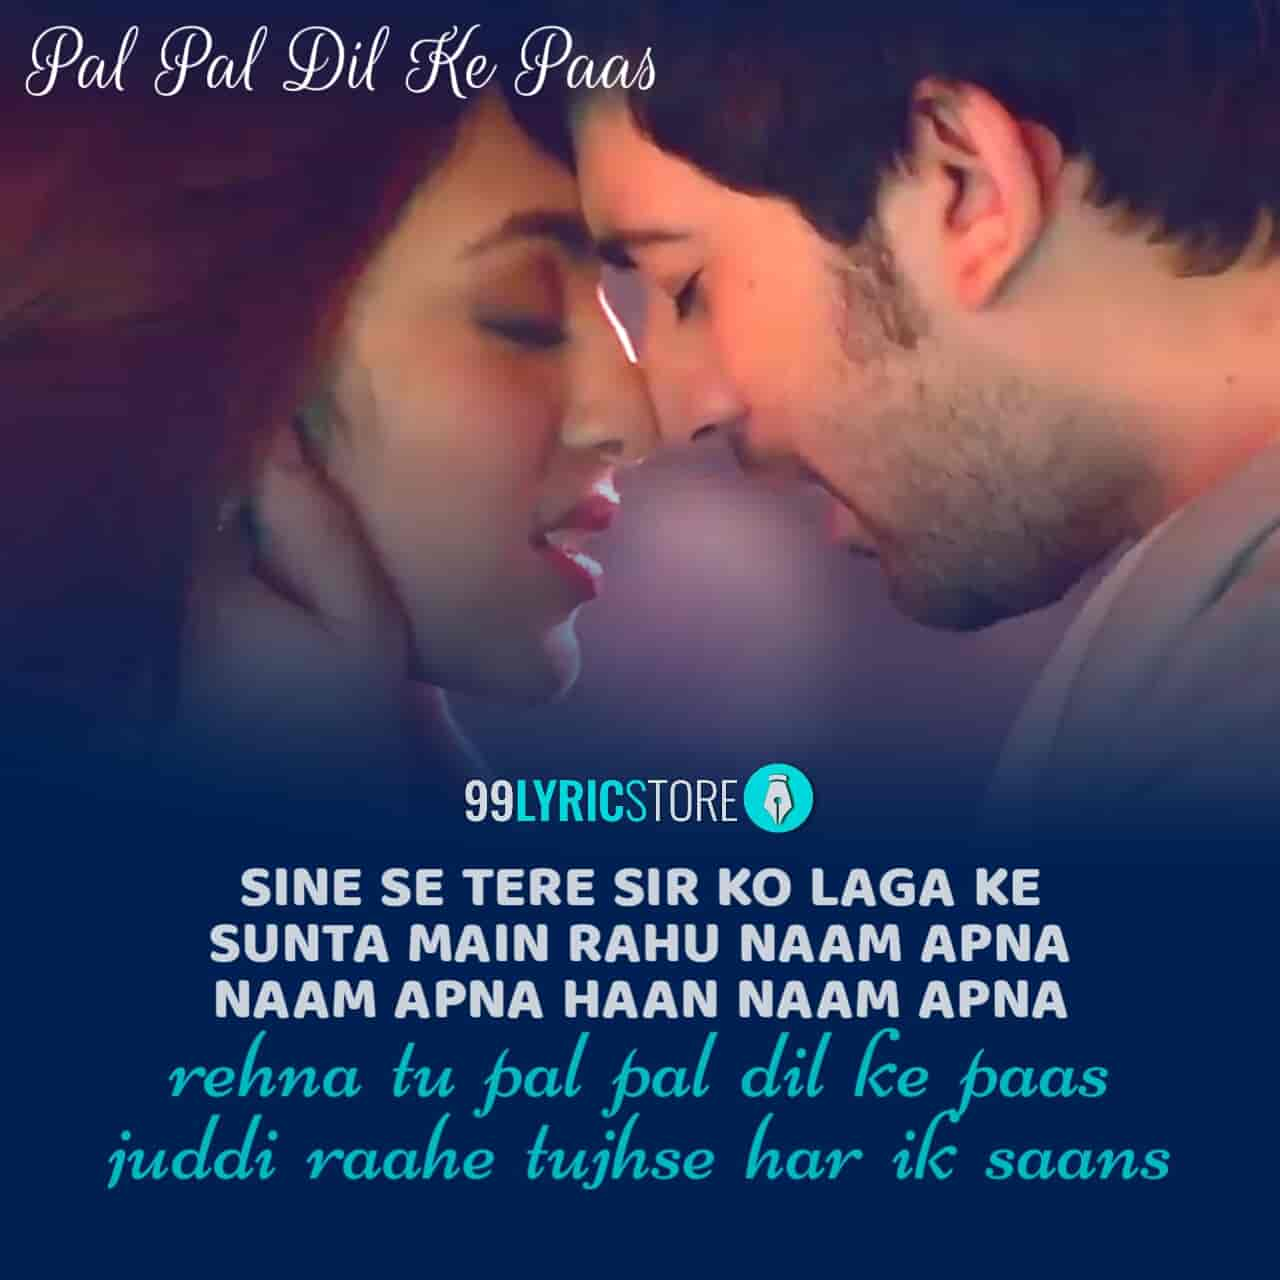 Pal Pal Dil Ke Paas Title Track sung by Arijit Singh and Parampara Thakur